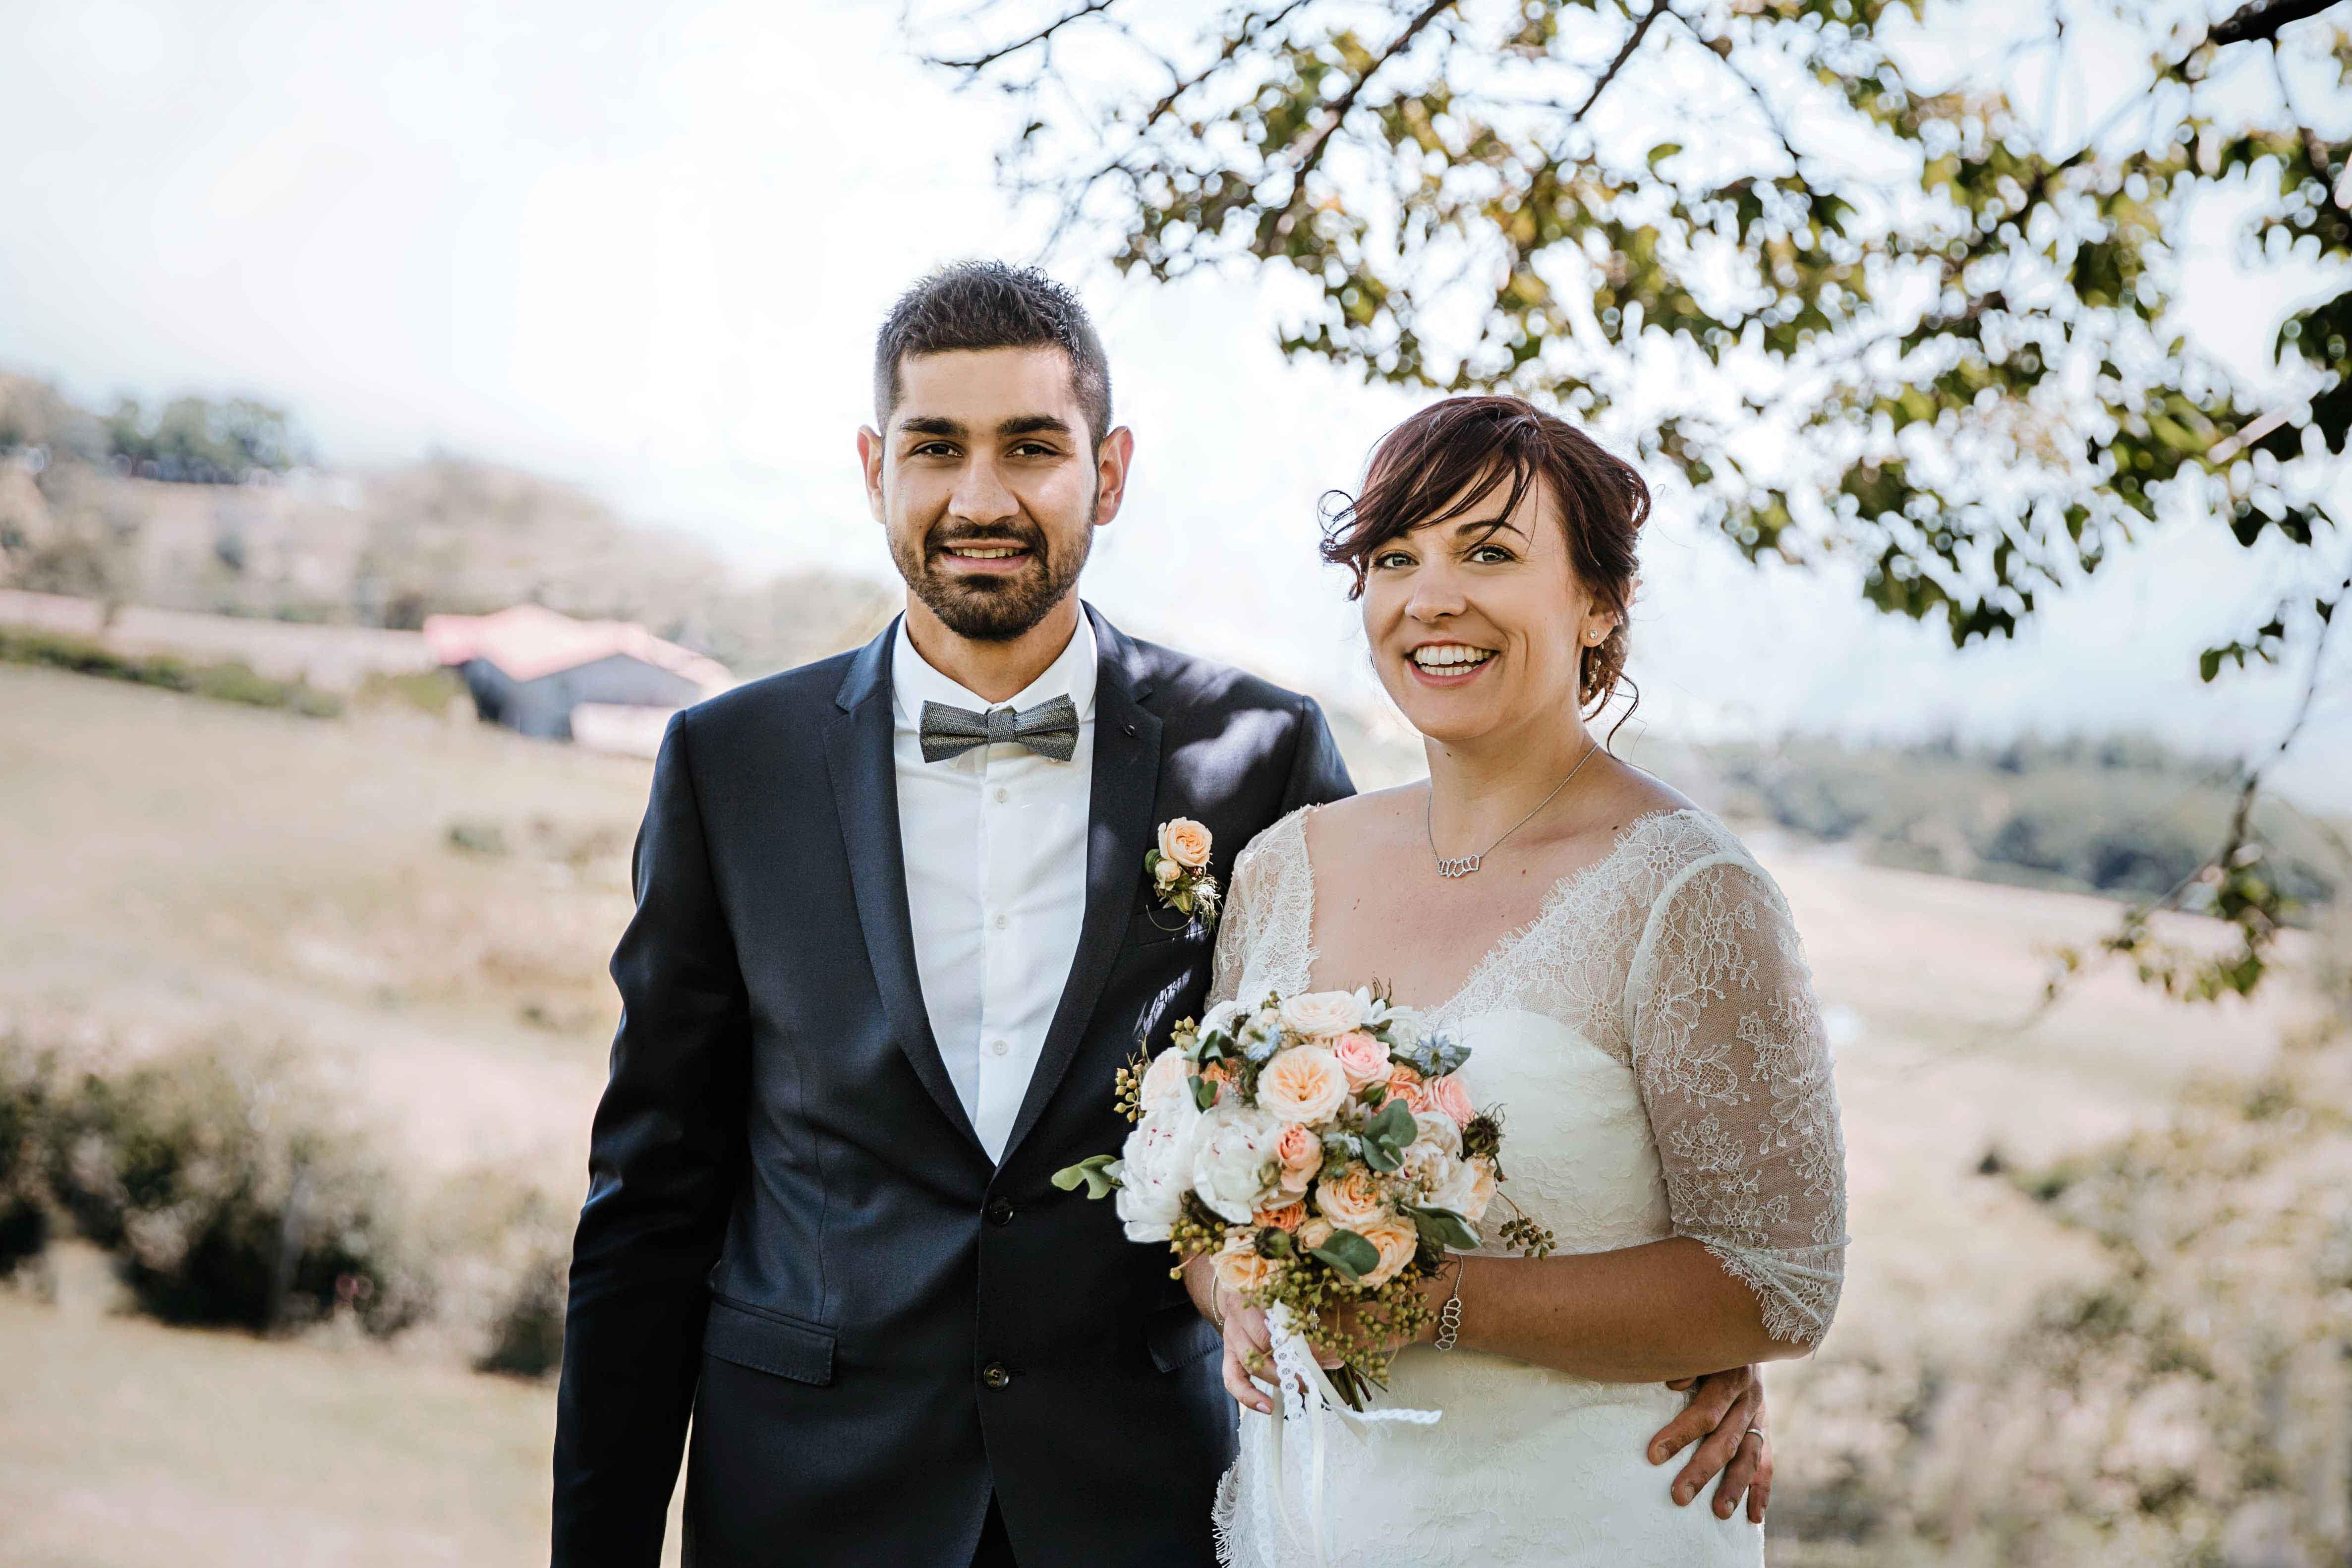 photographe beaujolais lyon séance couple